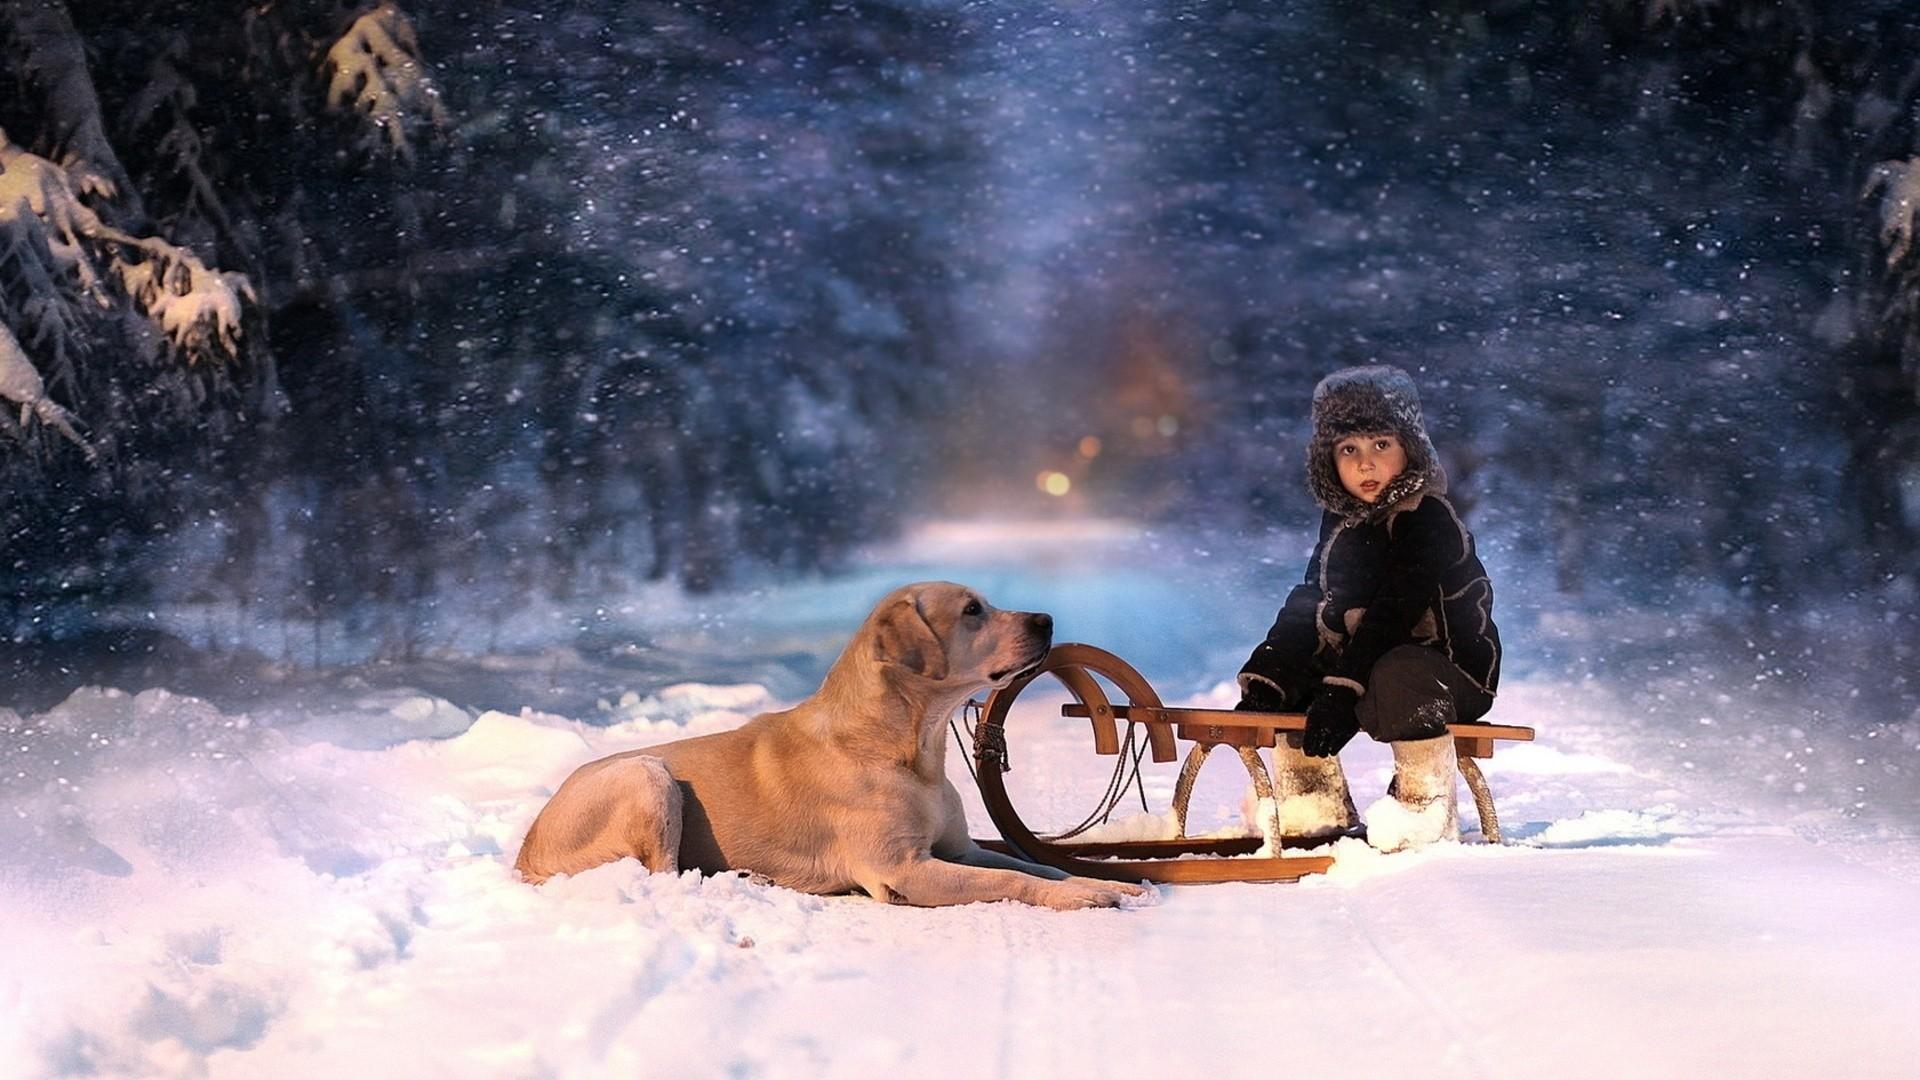 holidays christmas winter snow seasons seasonal roads snowing .